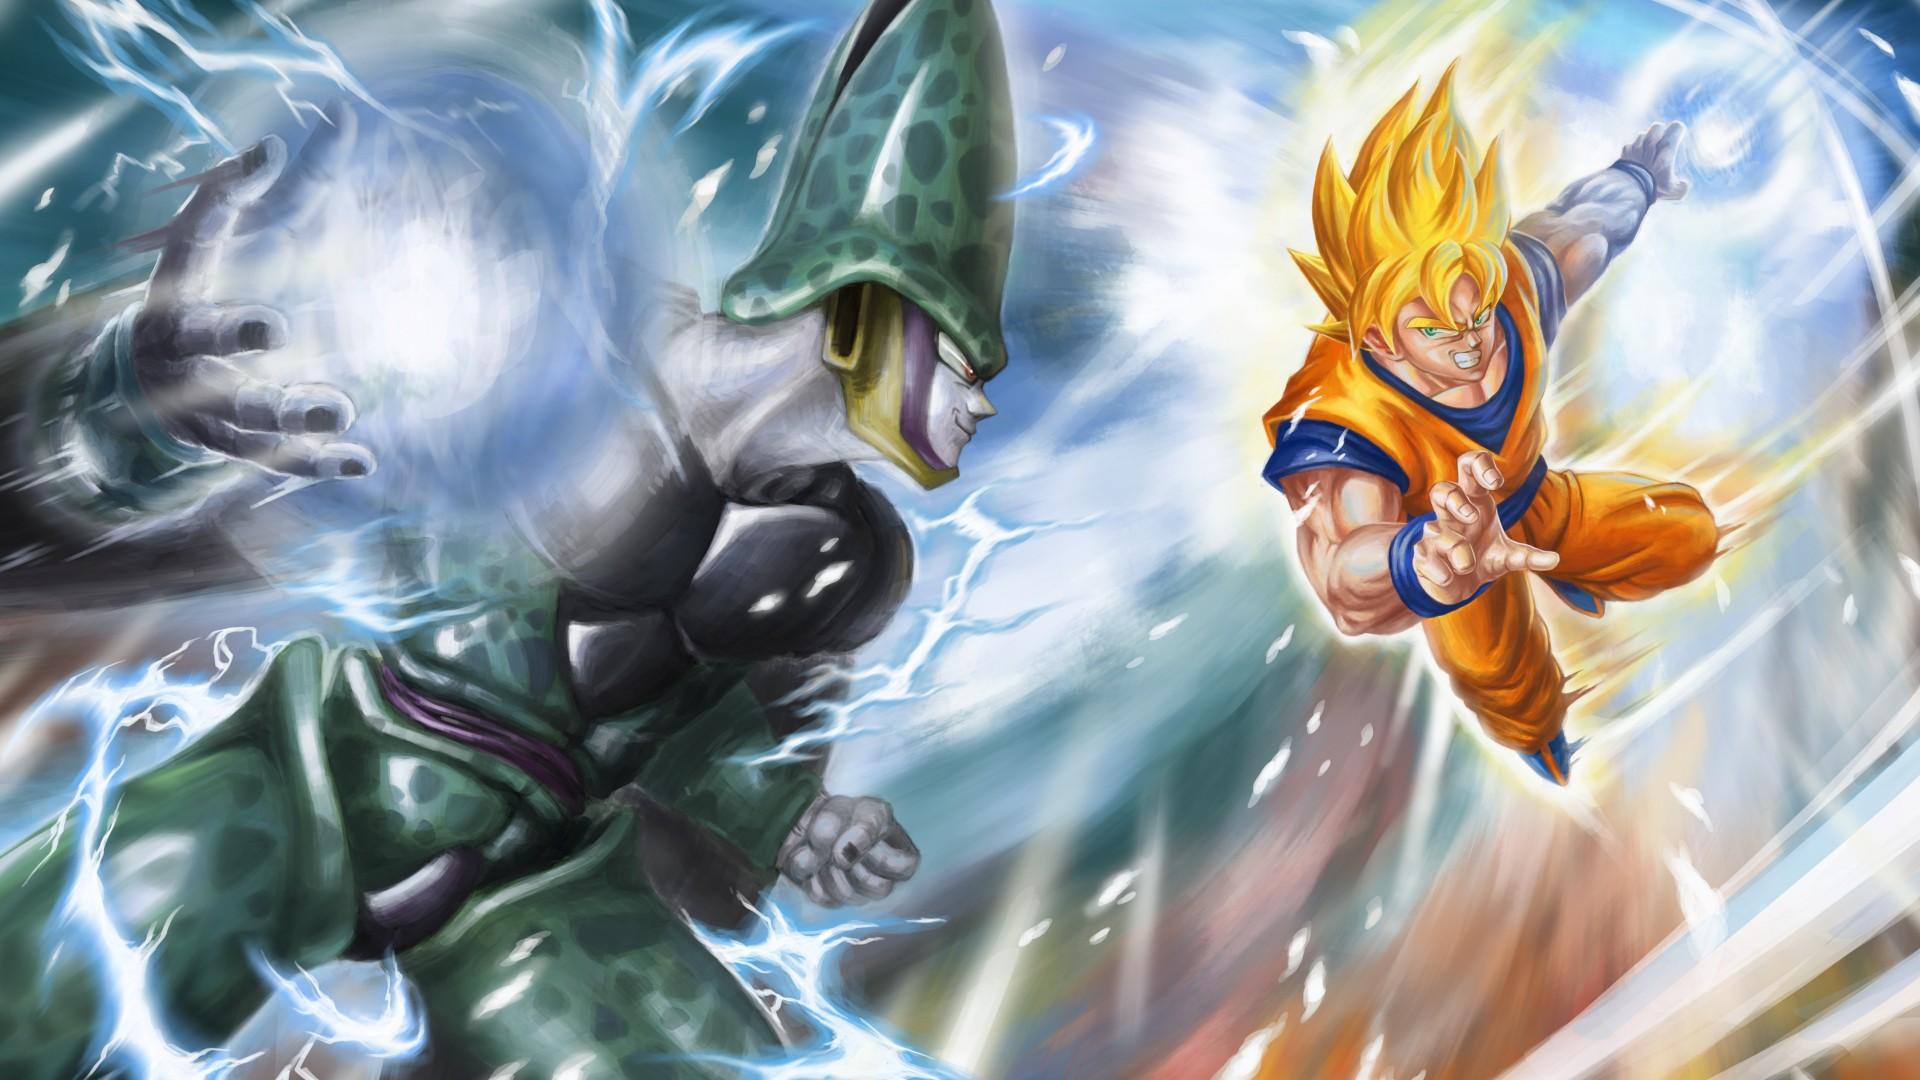 Dragon Ball Z Son Goku Wallpapers Background 6082 1920x1080